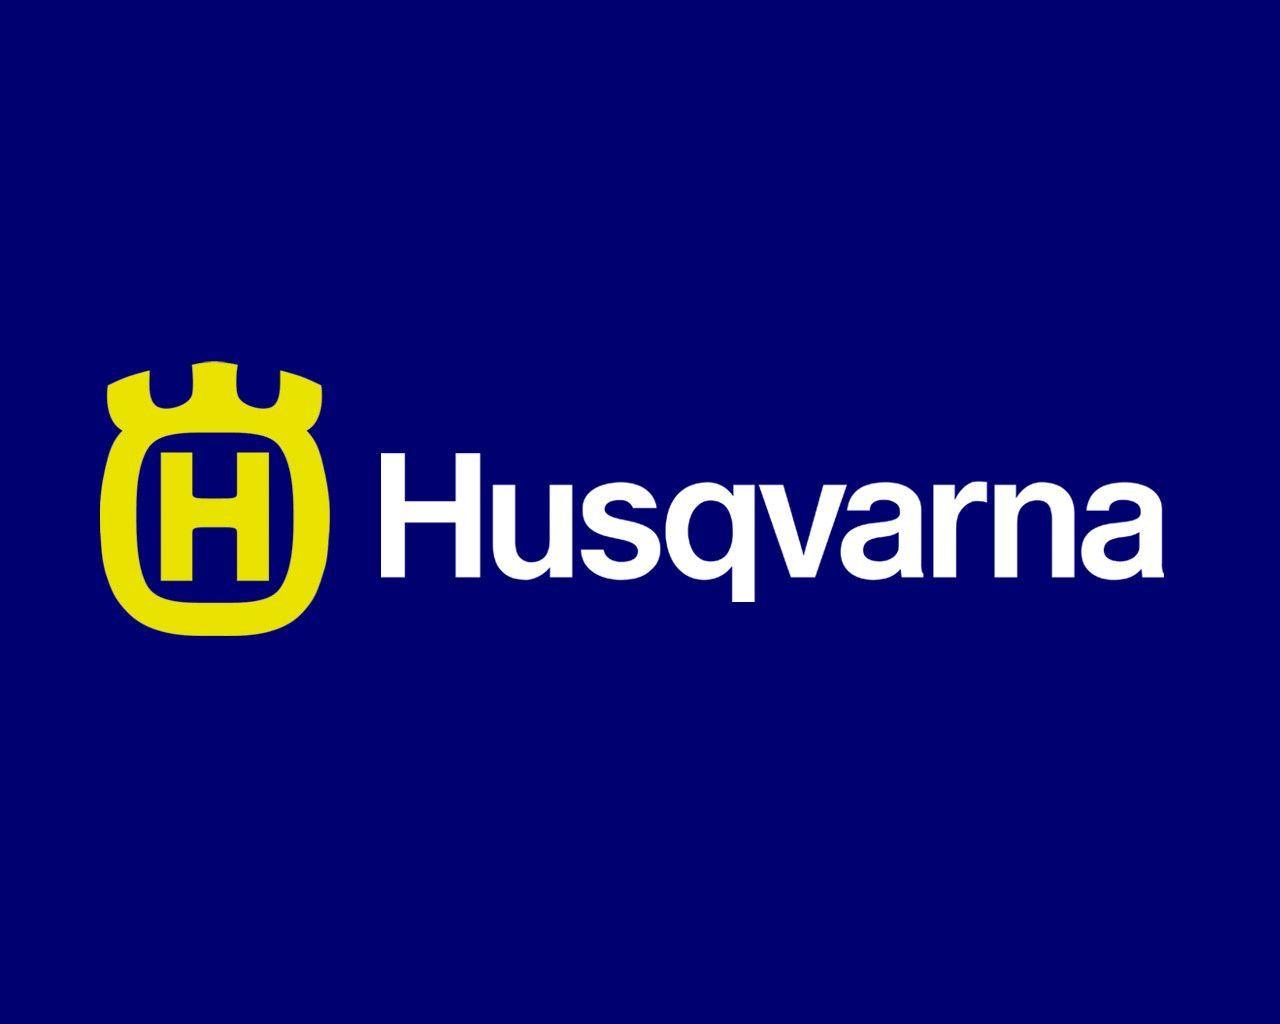 Le Logo Husqvarna Png 1 600 1 159 Pixels Kettensagenschnitzen Husqvarna Husqvarna Rider